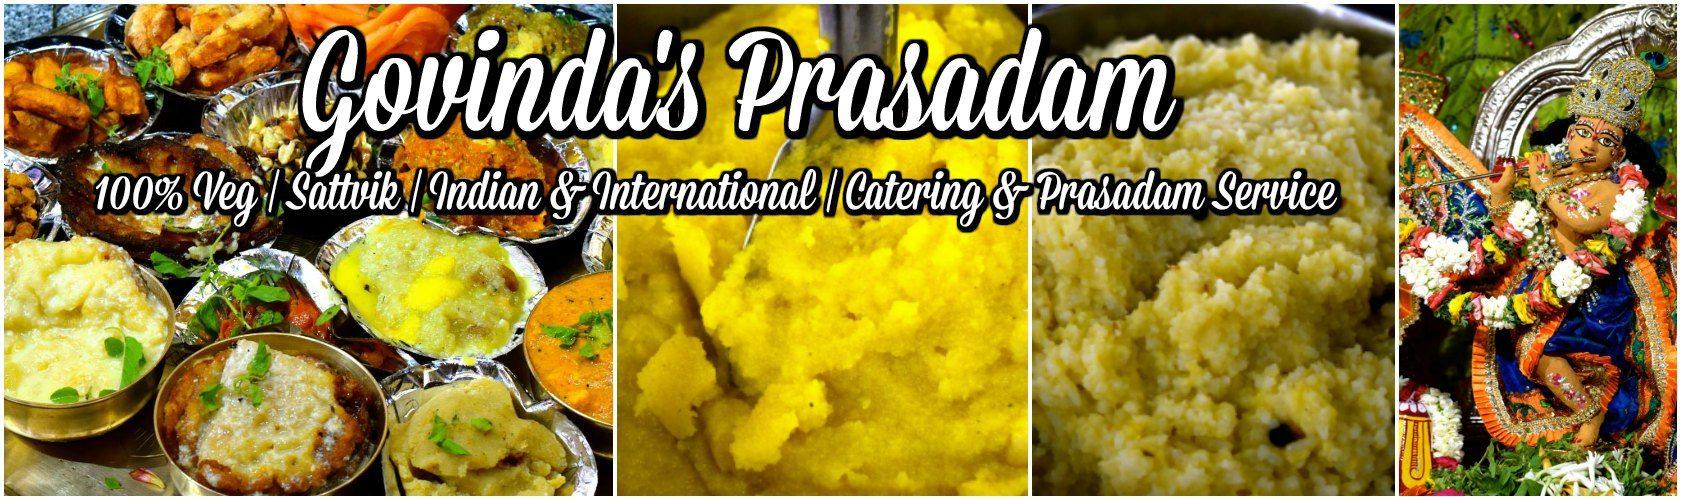 Govinda's Prasadam & Catering Service